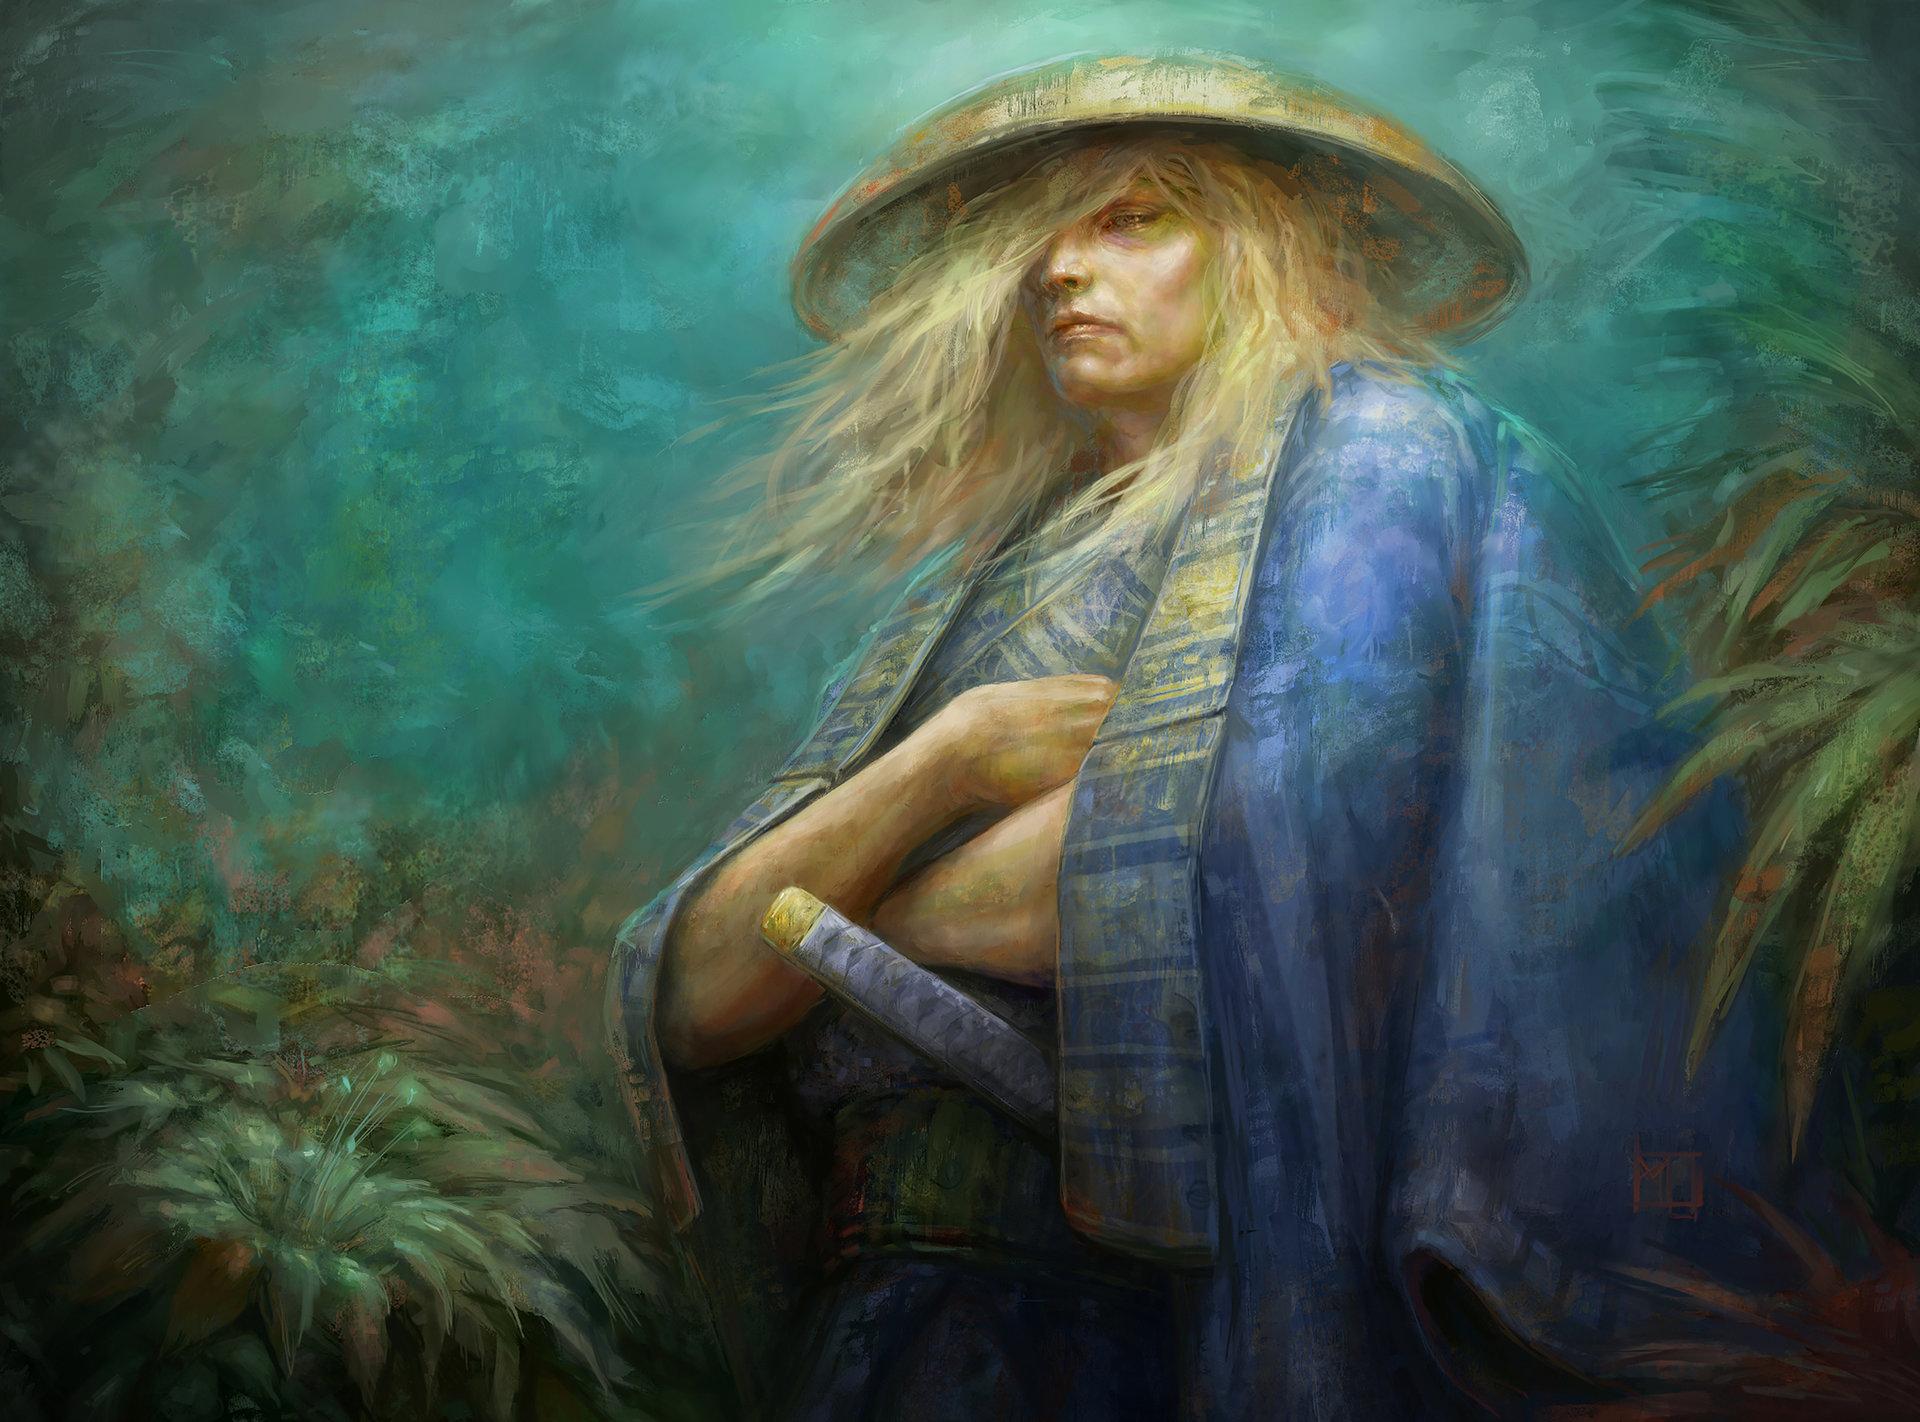 Muyoung kim asahina shugenja